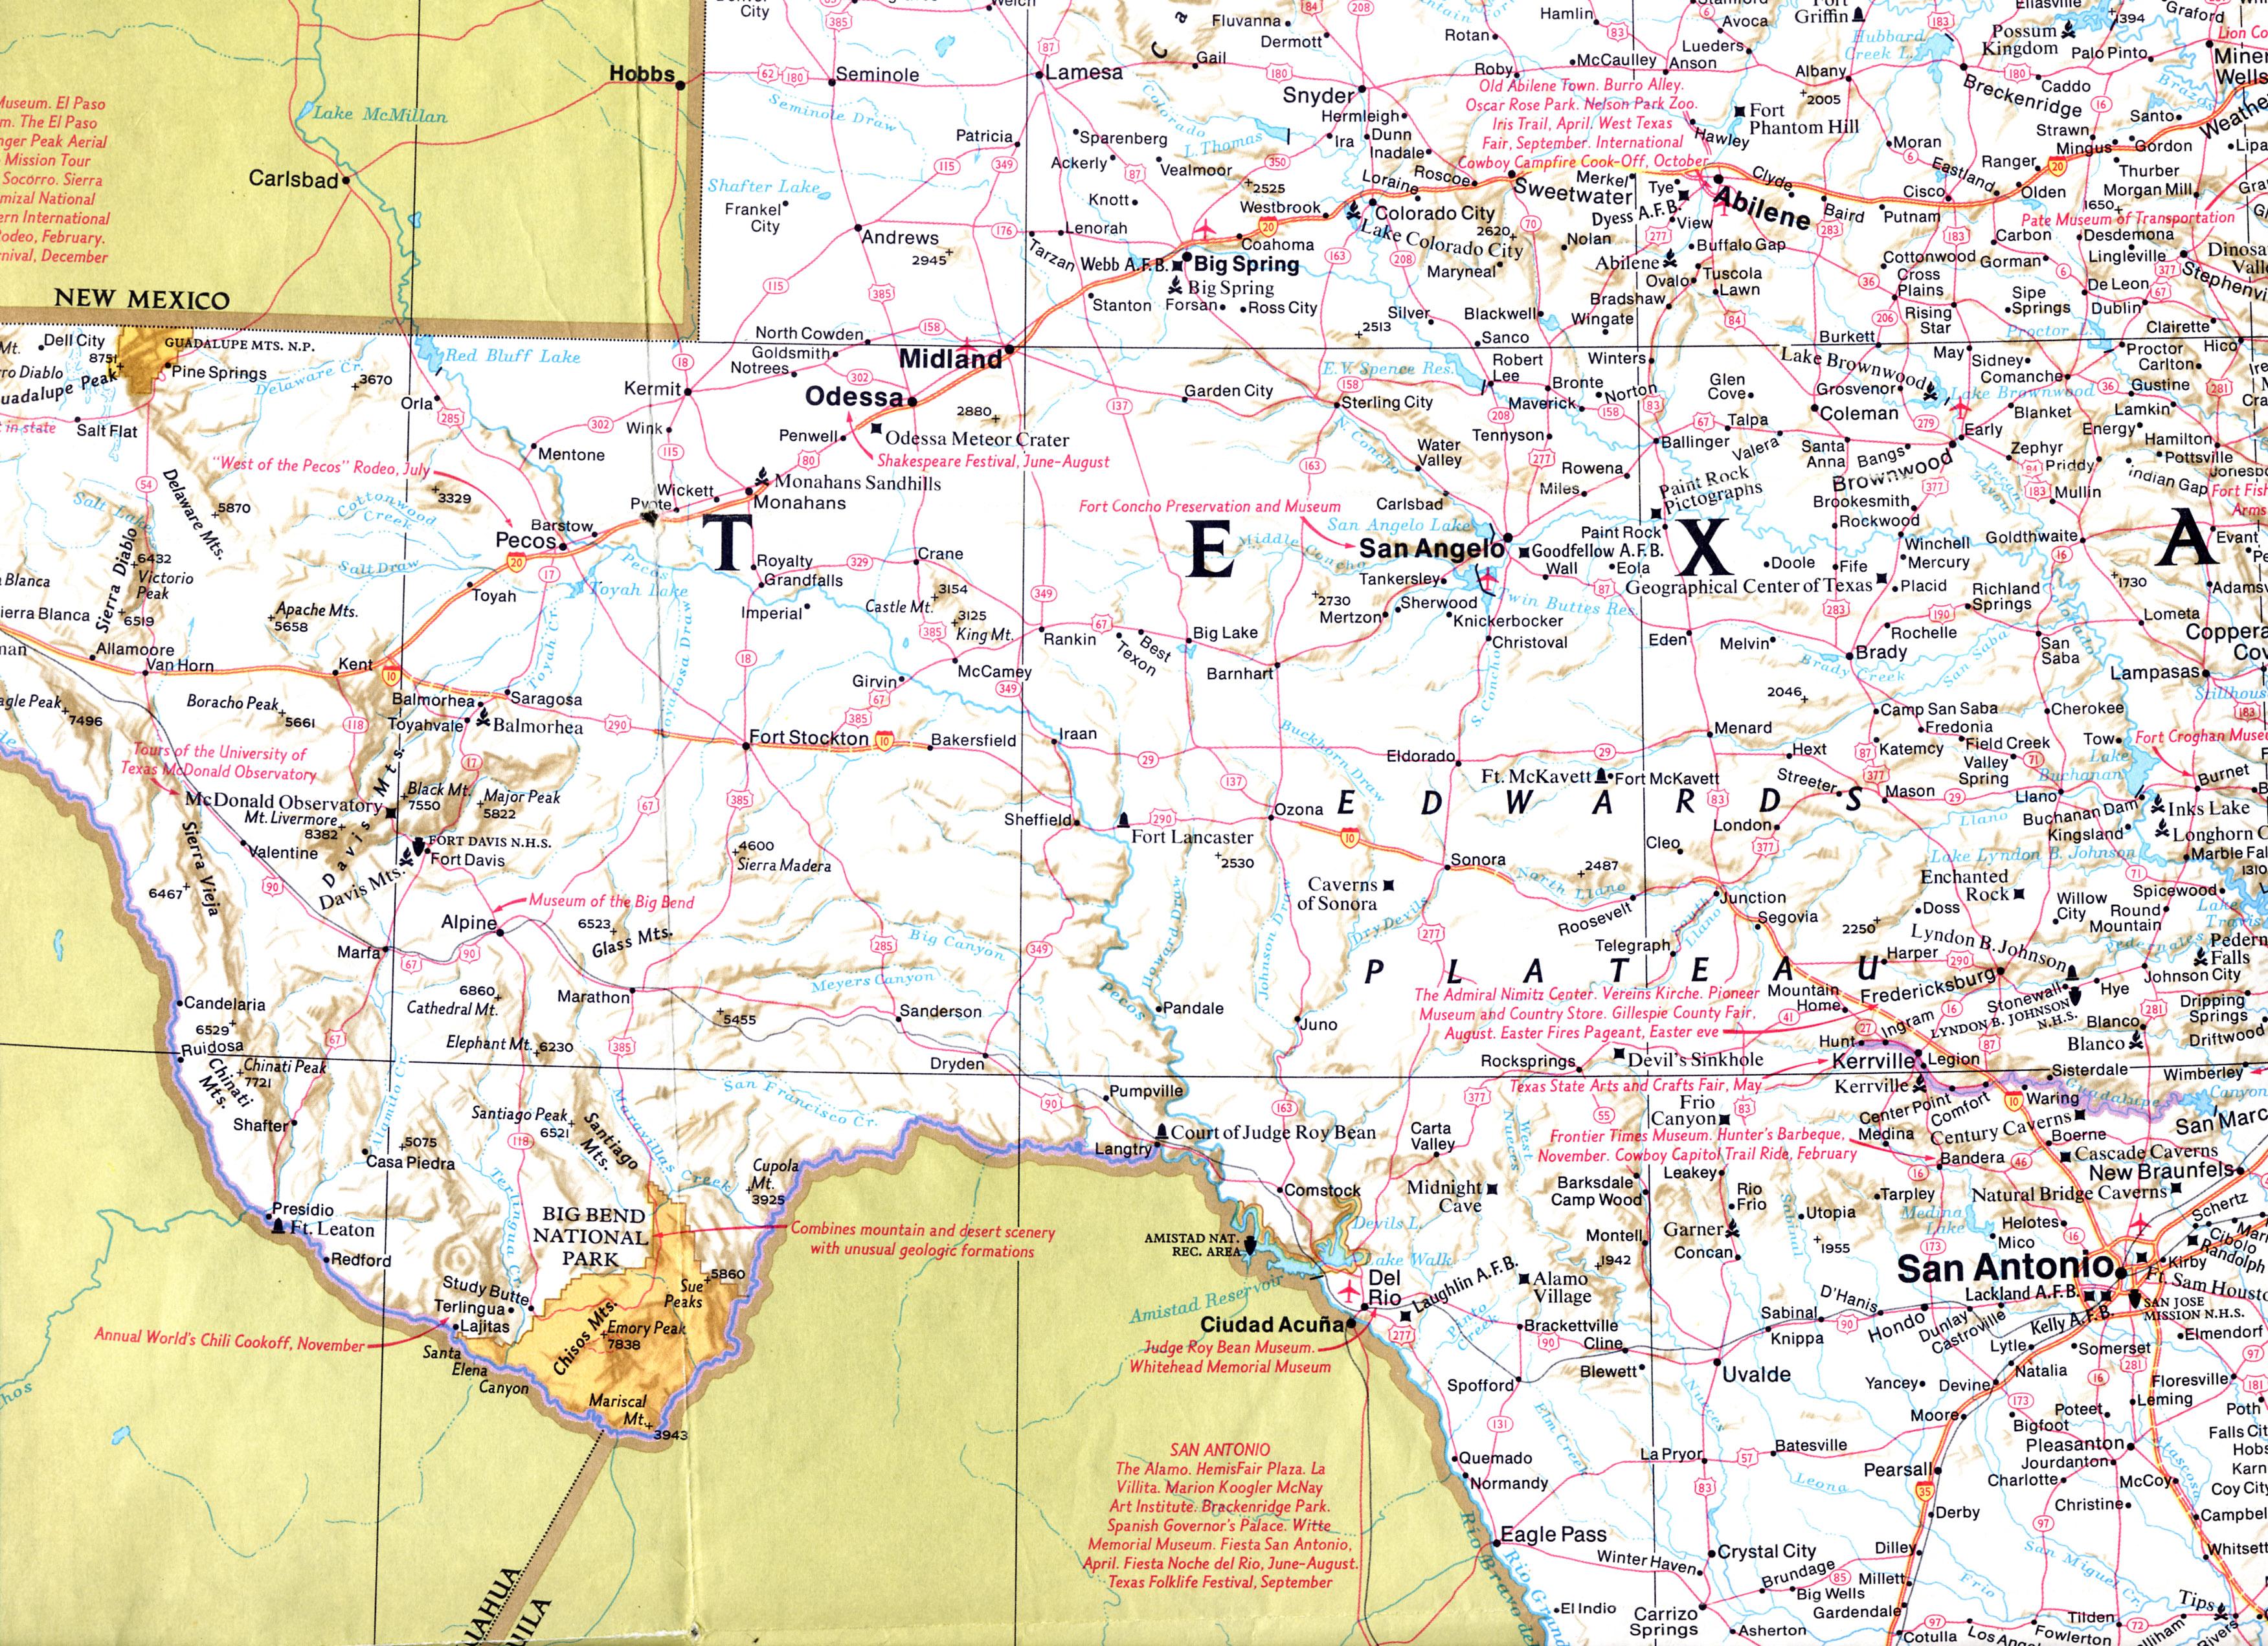 Interstate 10 West Texas Photos Pecos Crockett Counties - Pecos Texas Map